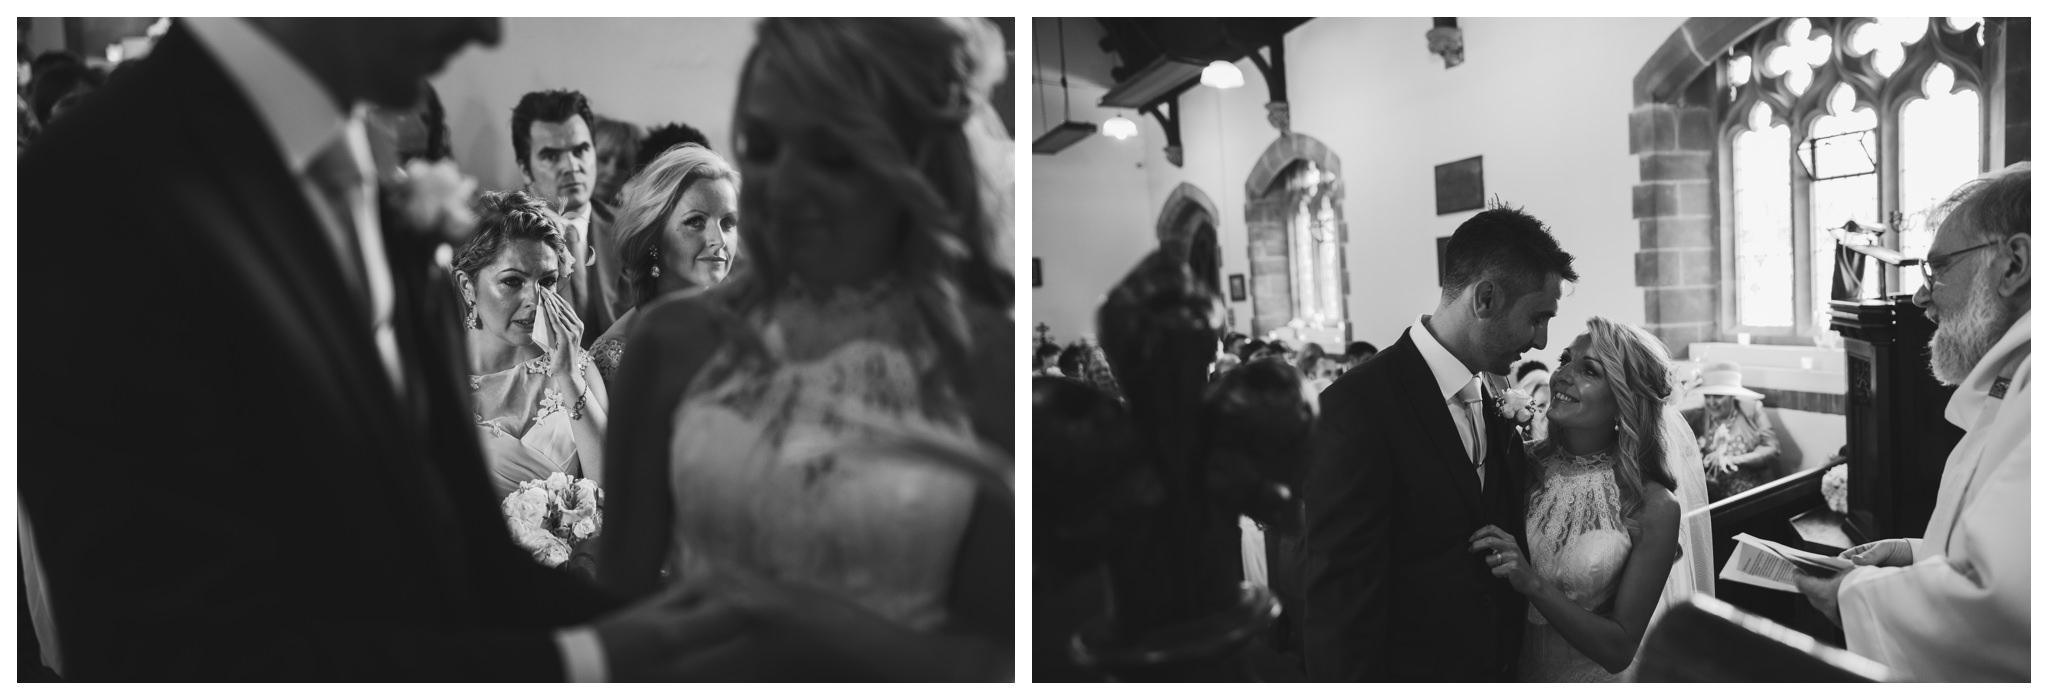 Richard Savage Photography - Wedding - Peterstone Court Brecon - 2016-05-11_0026